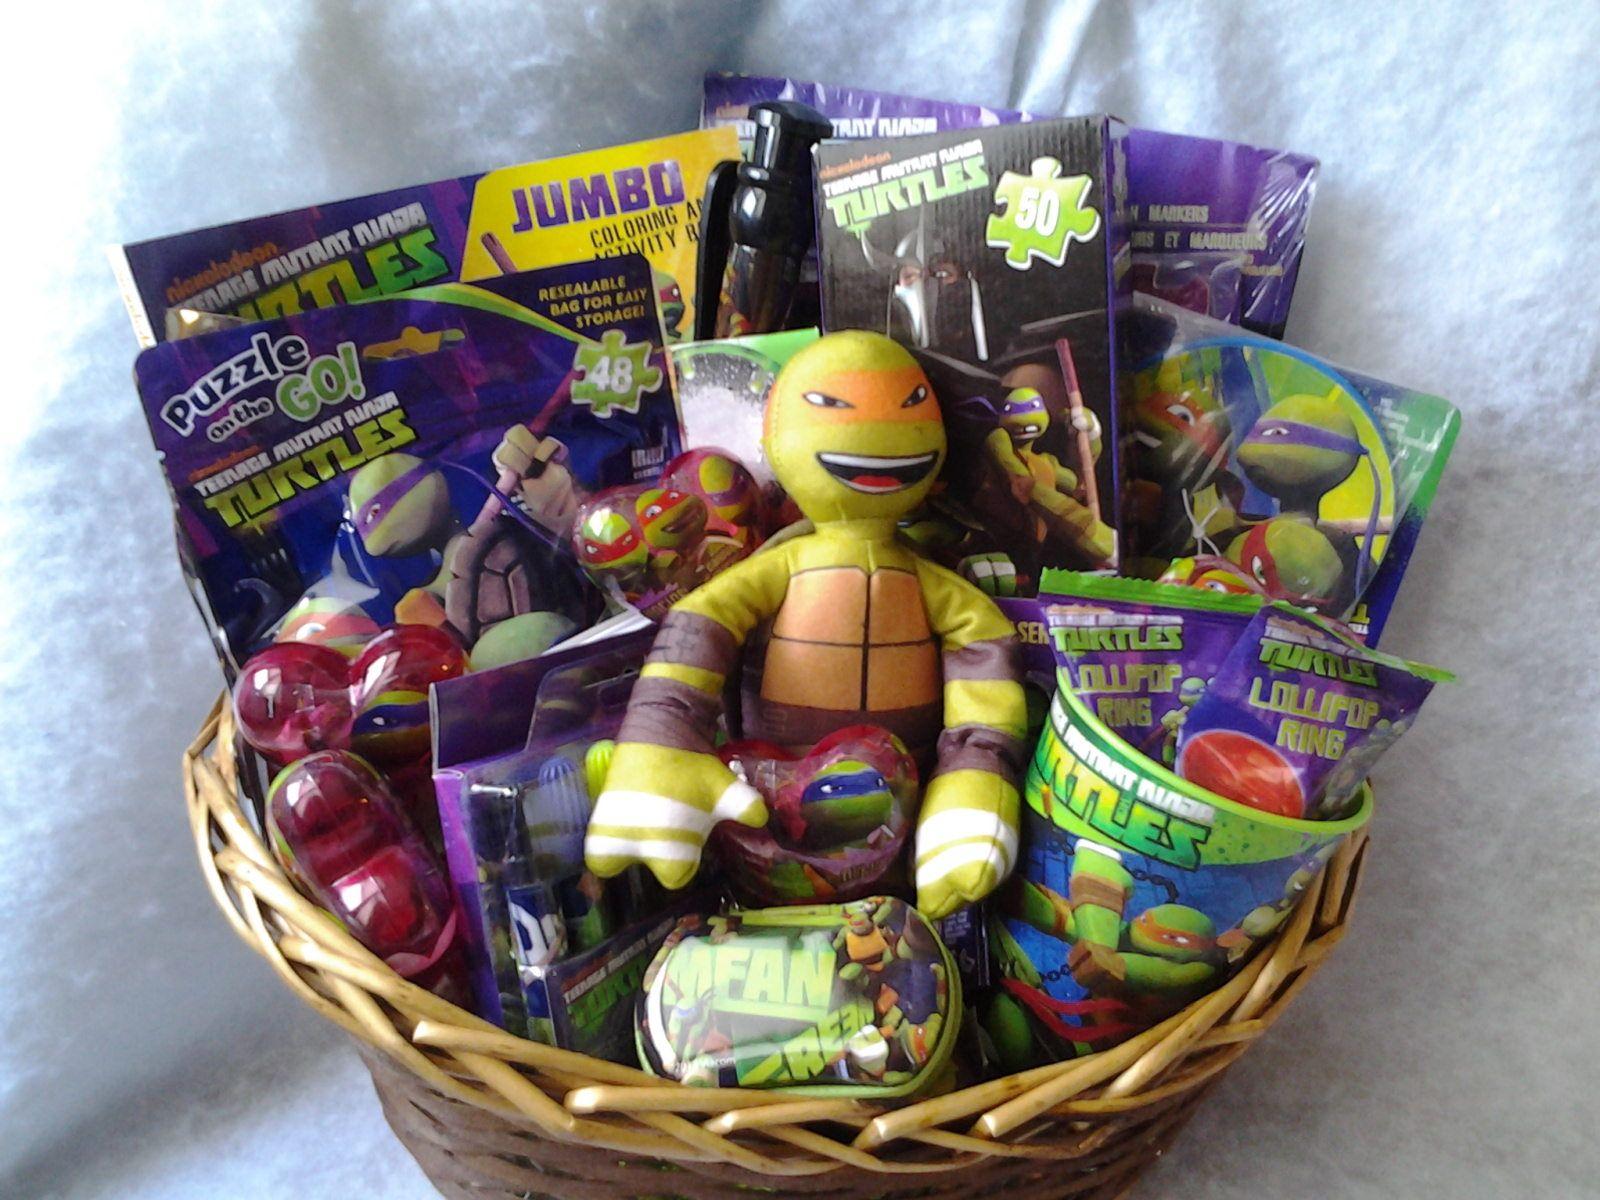 Teenage Mutant Ninja Turtles Gift Basket From Connie S Creations Teenage Mutant Ninja Turtles Gifts Ninja Turtles Gifts Themed Gift Baskets